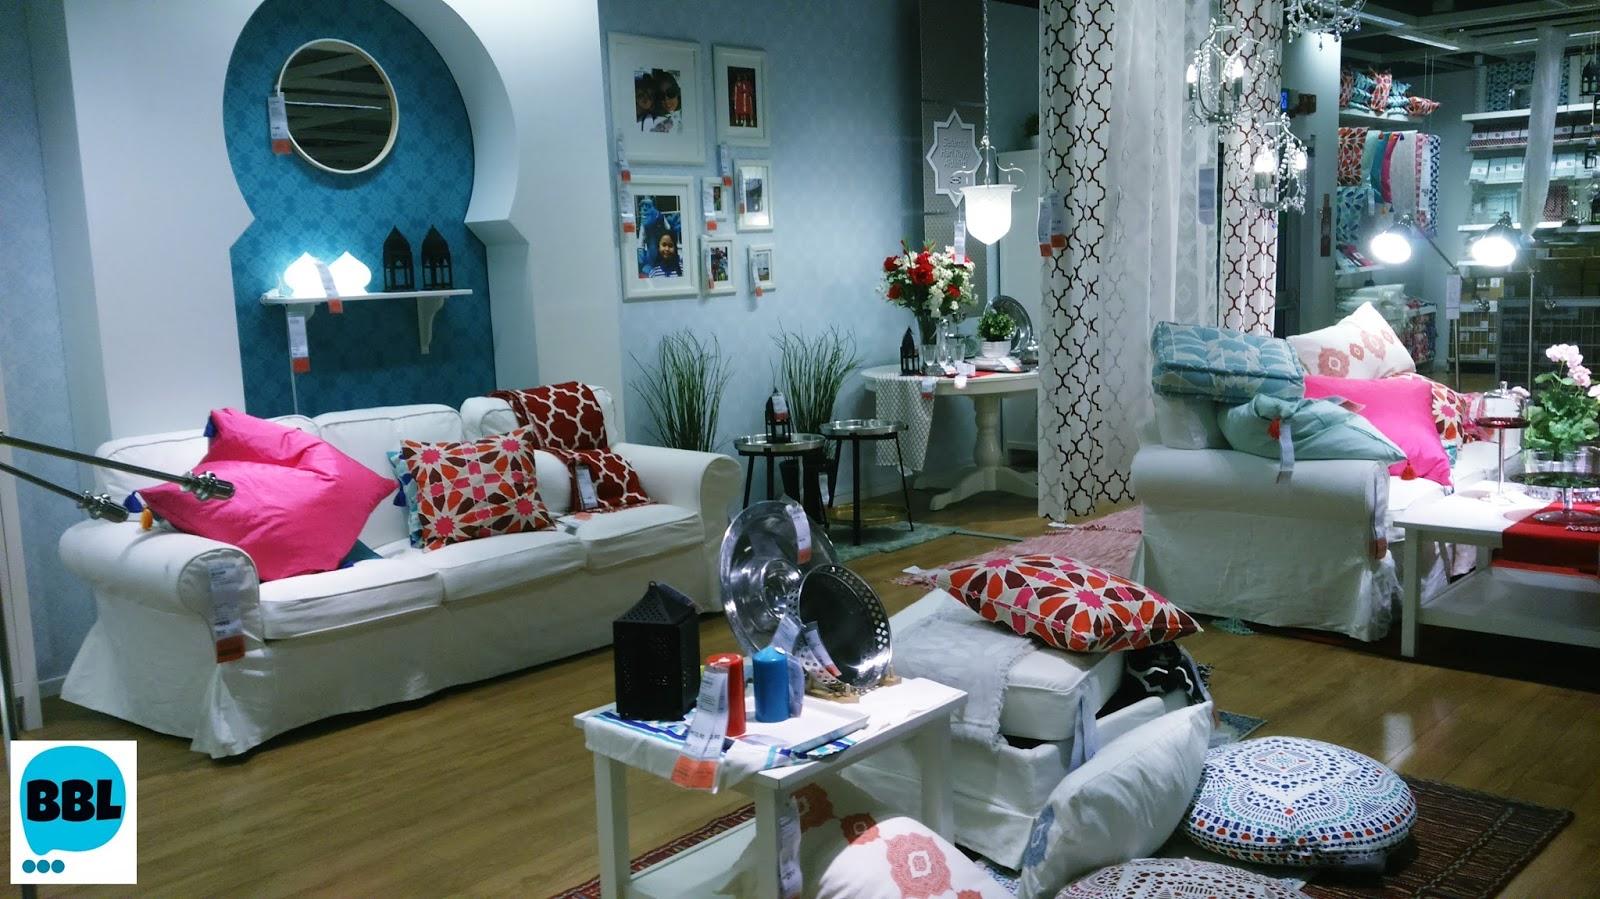 Hias Rumah Dengan Barang Ikea Desainrumahid Com